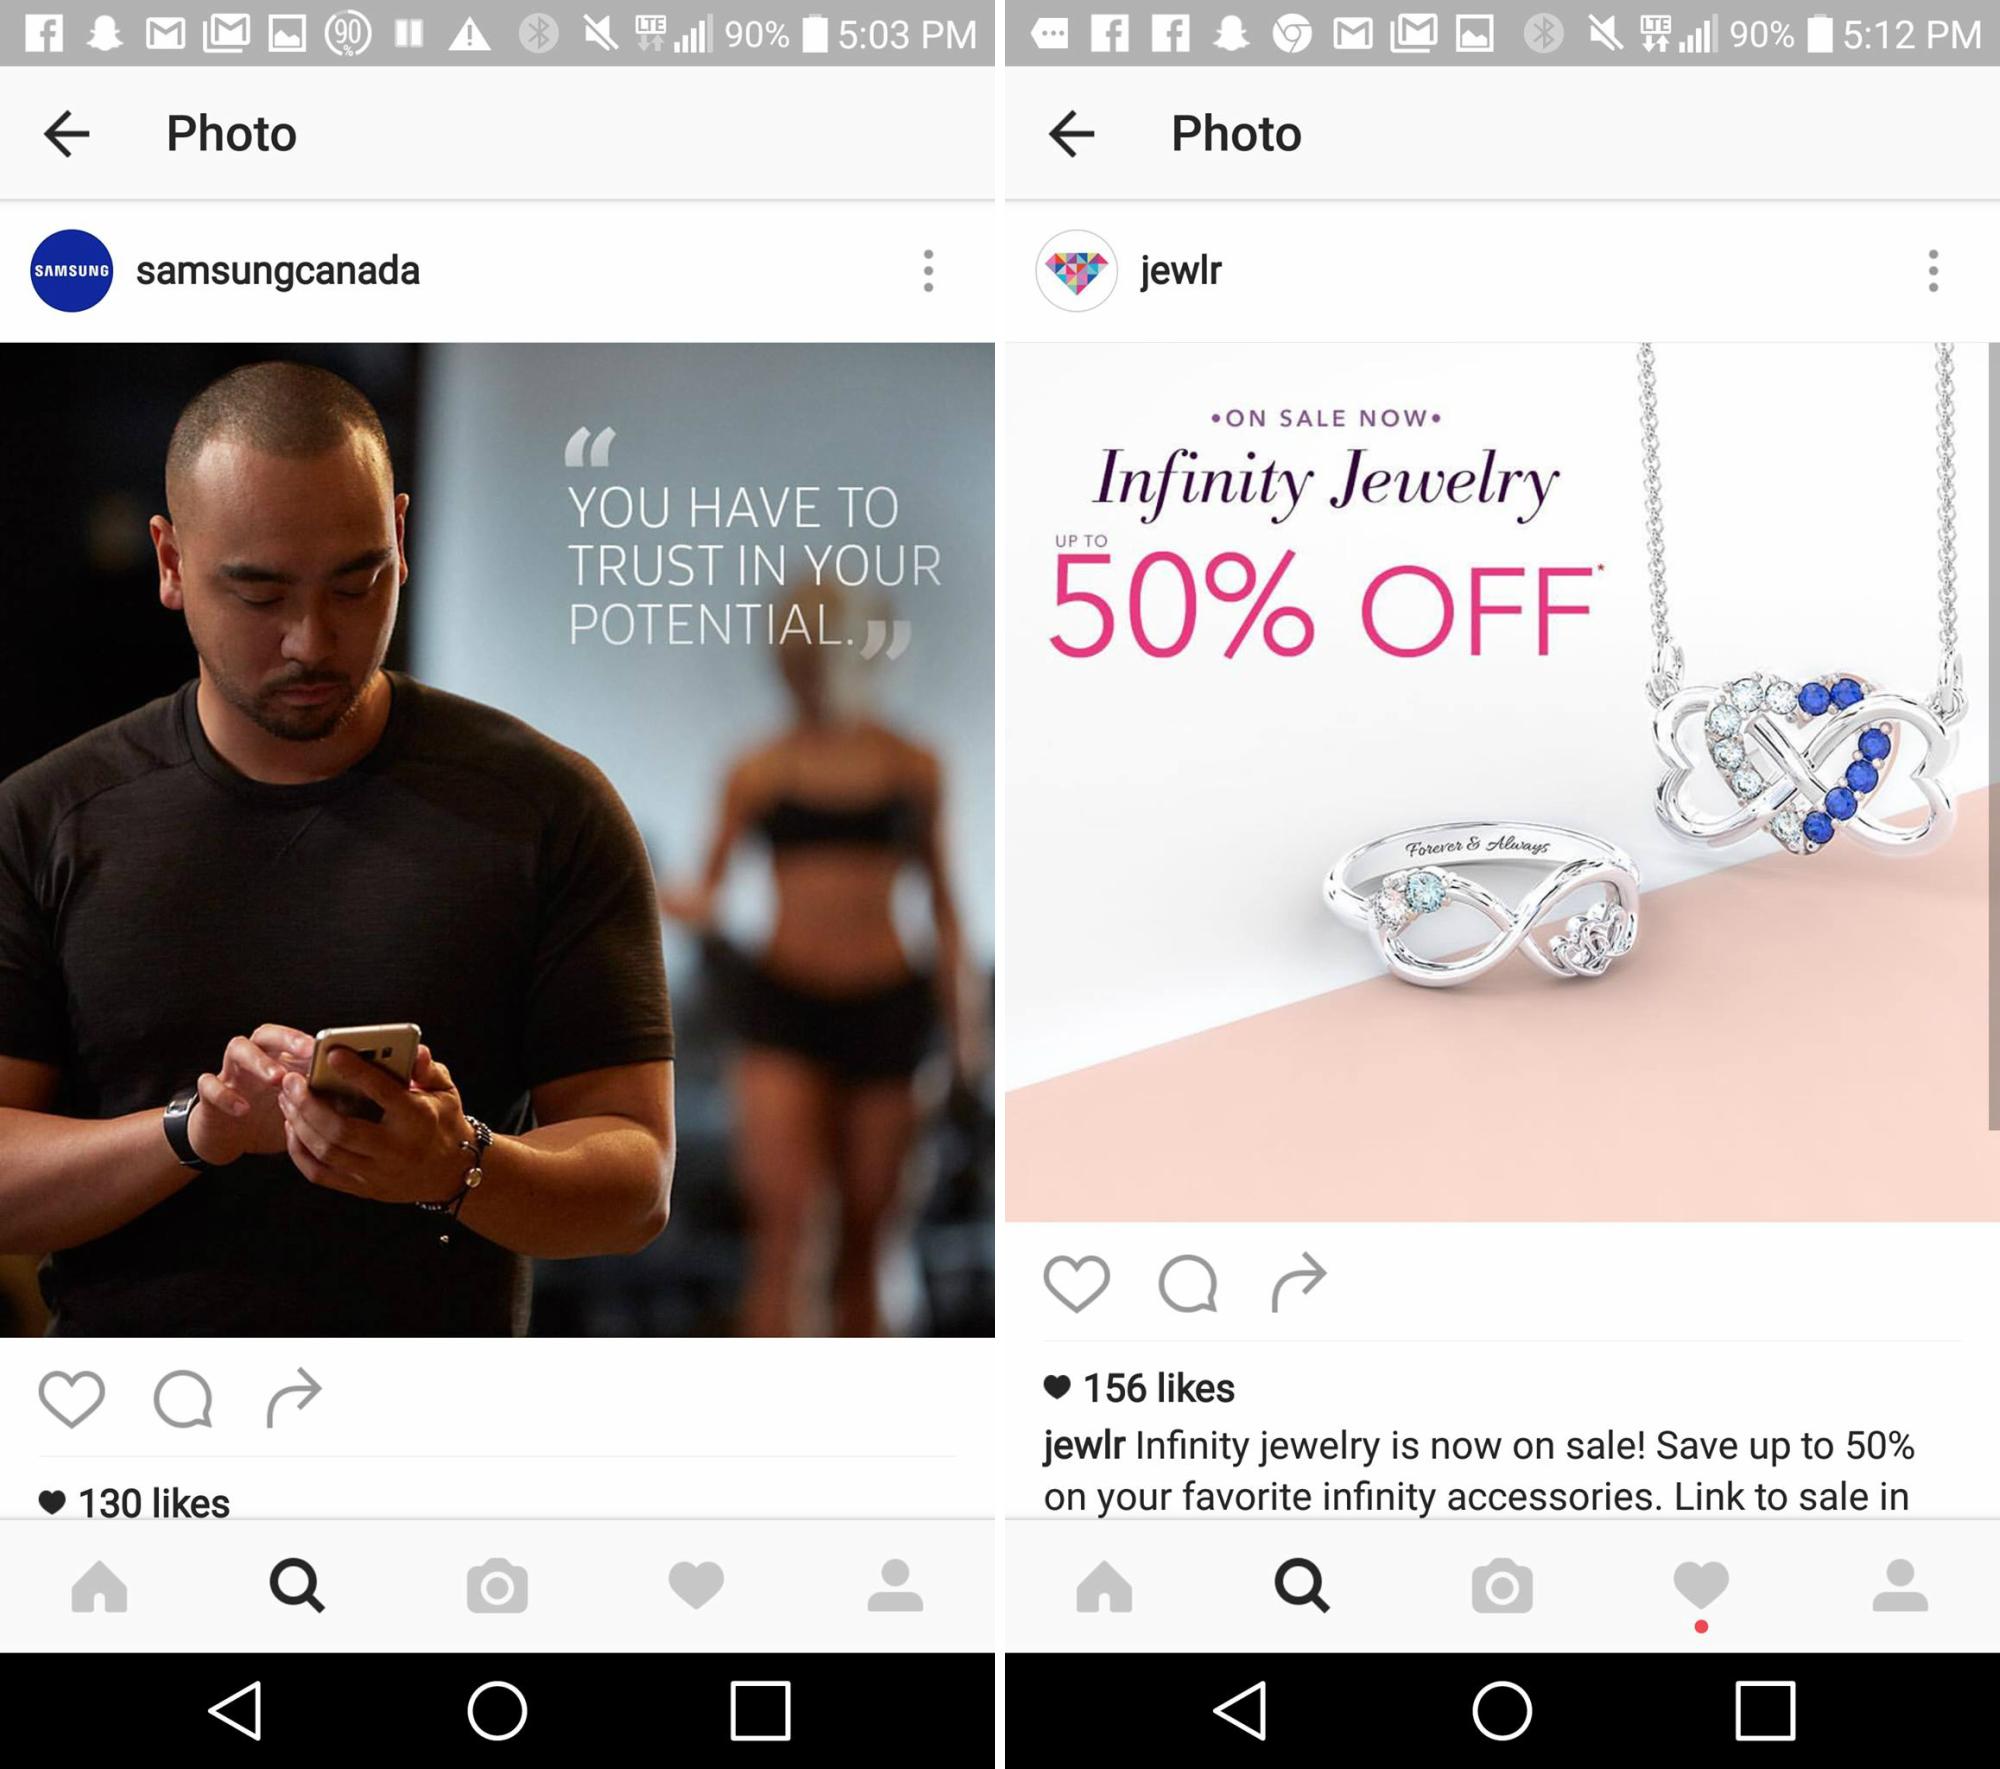 instagram-brands-samsung-jewlr